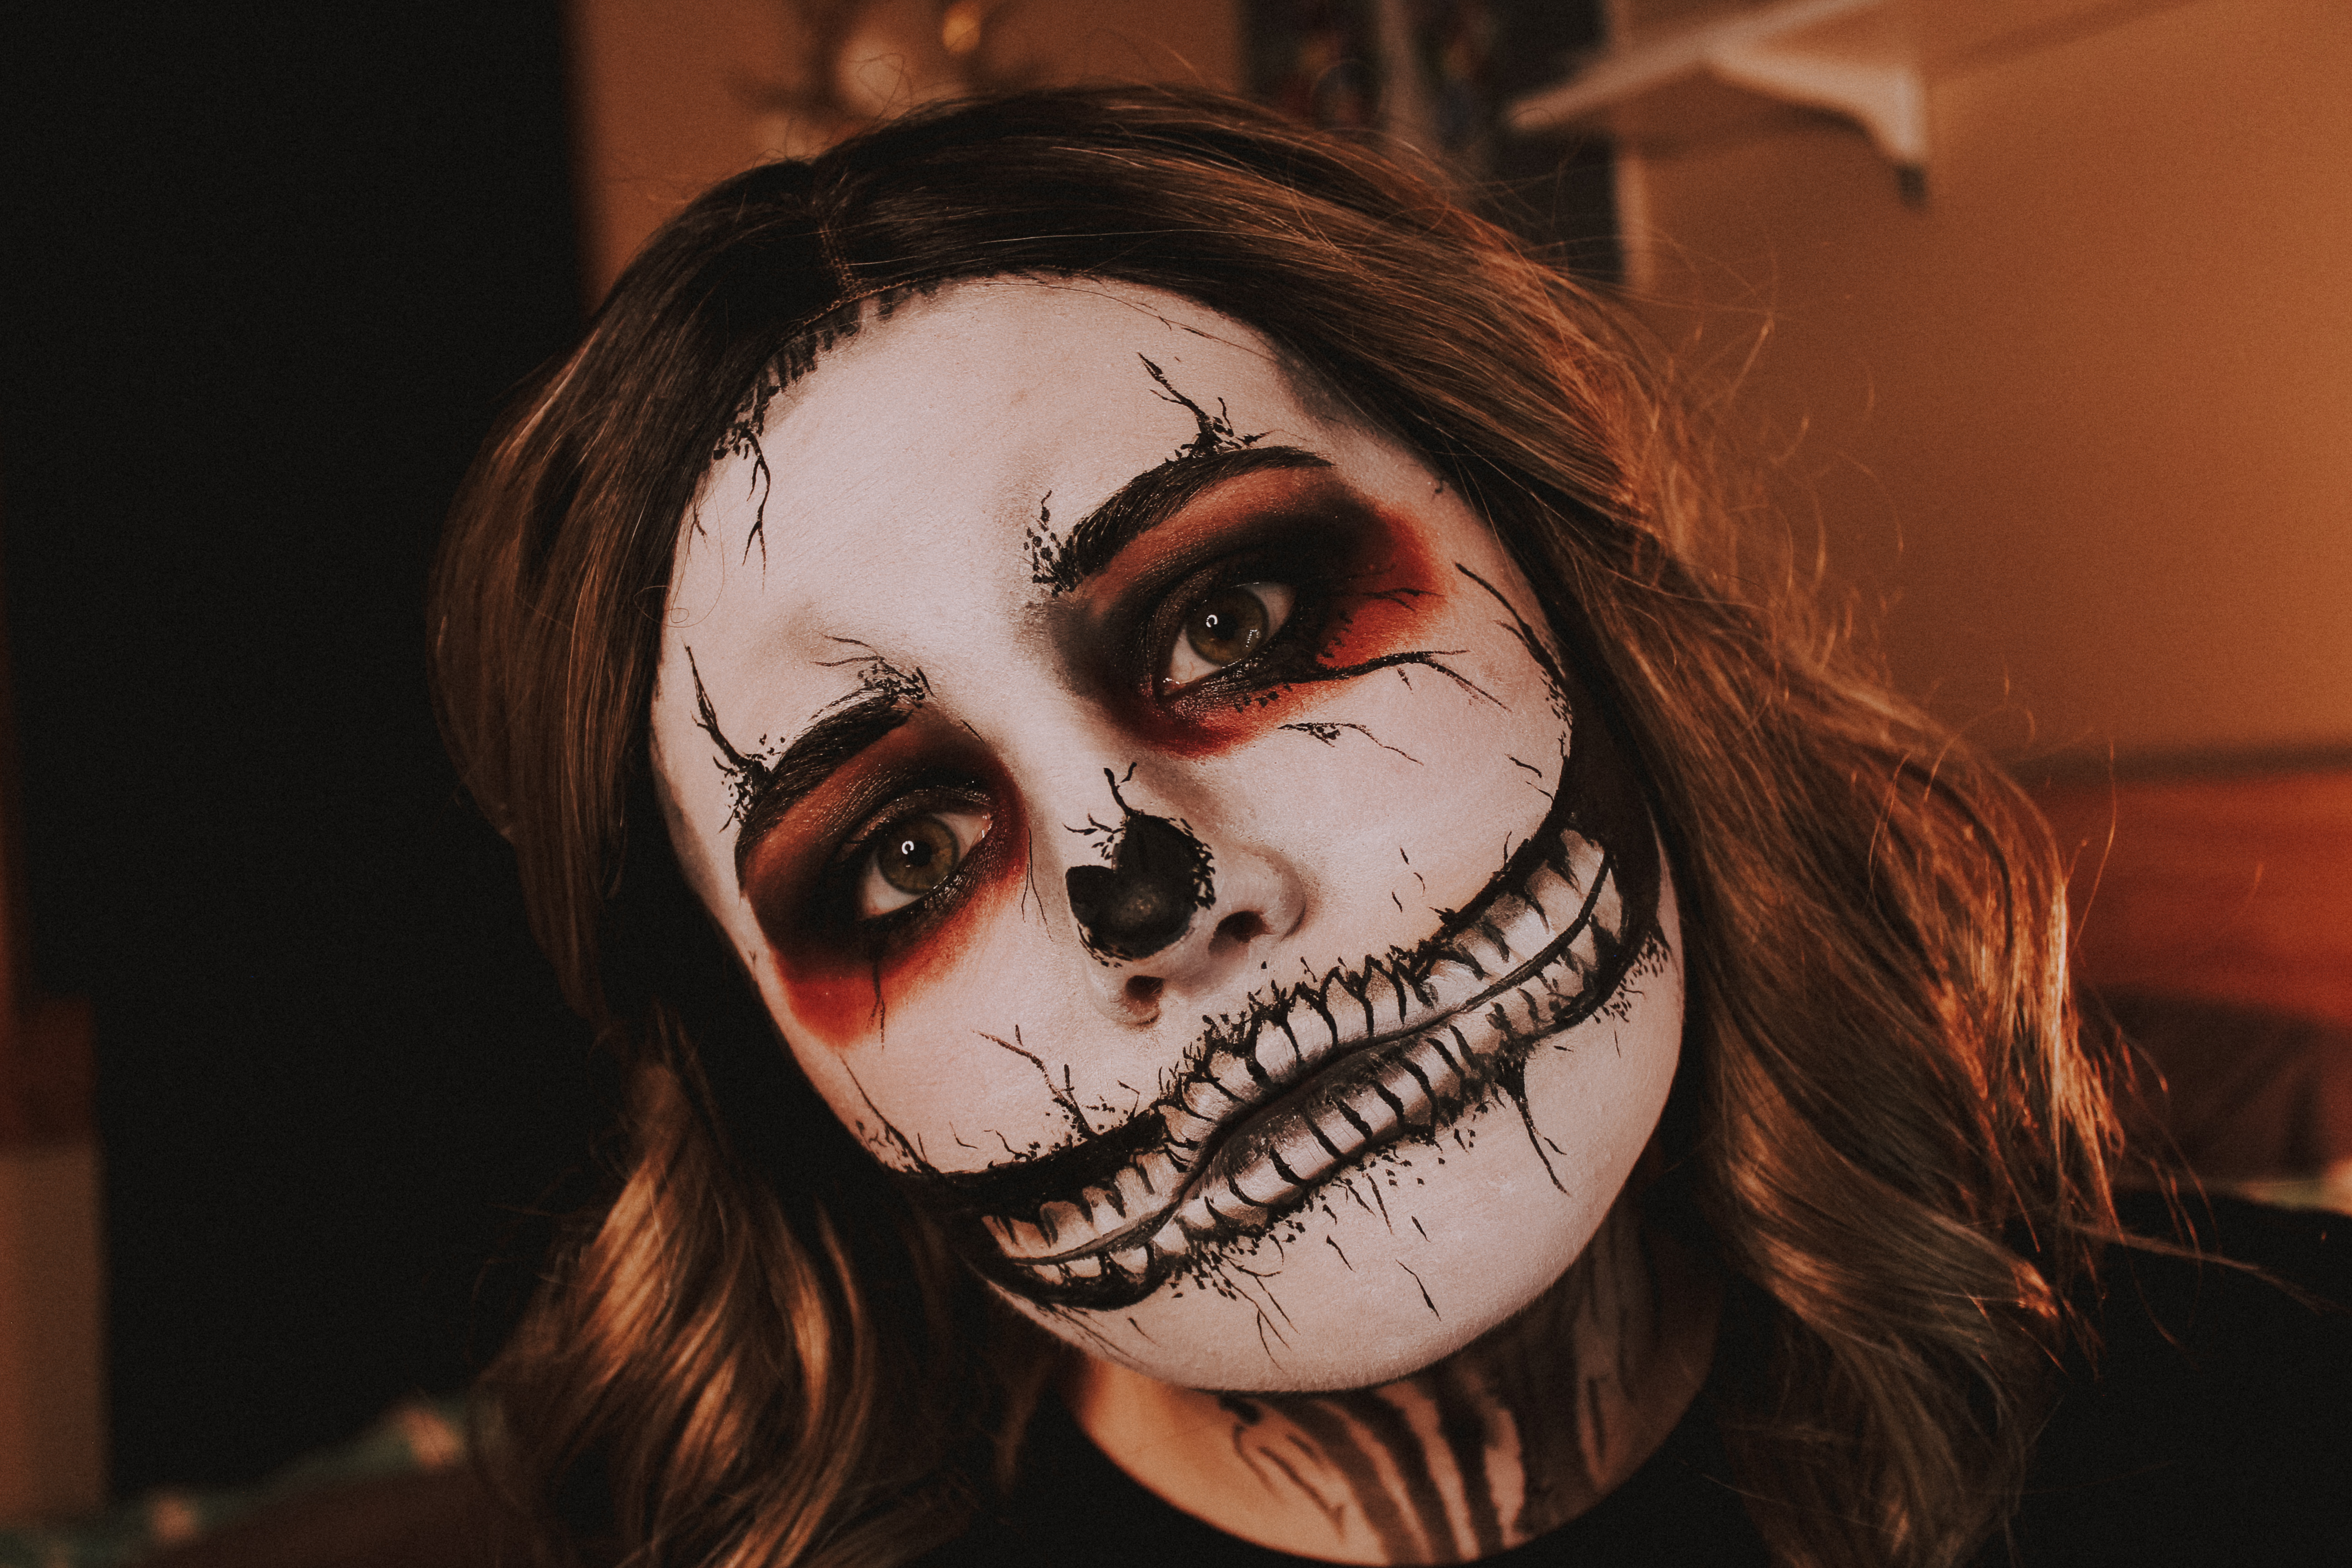 Grunge Skull Makeup 4